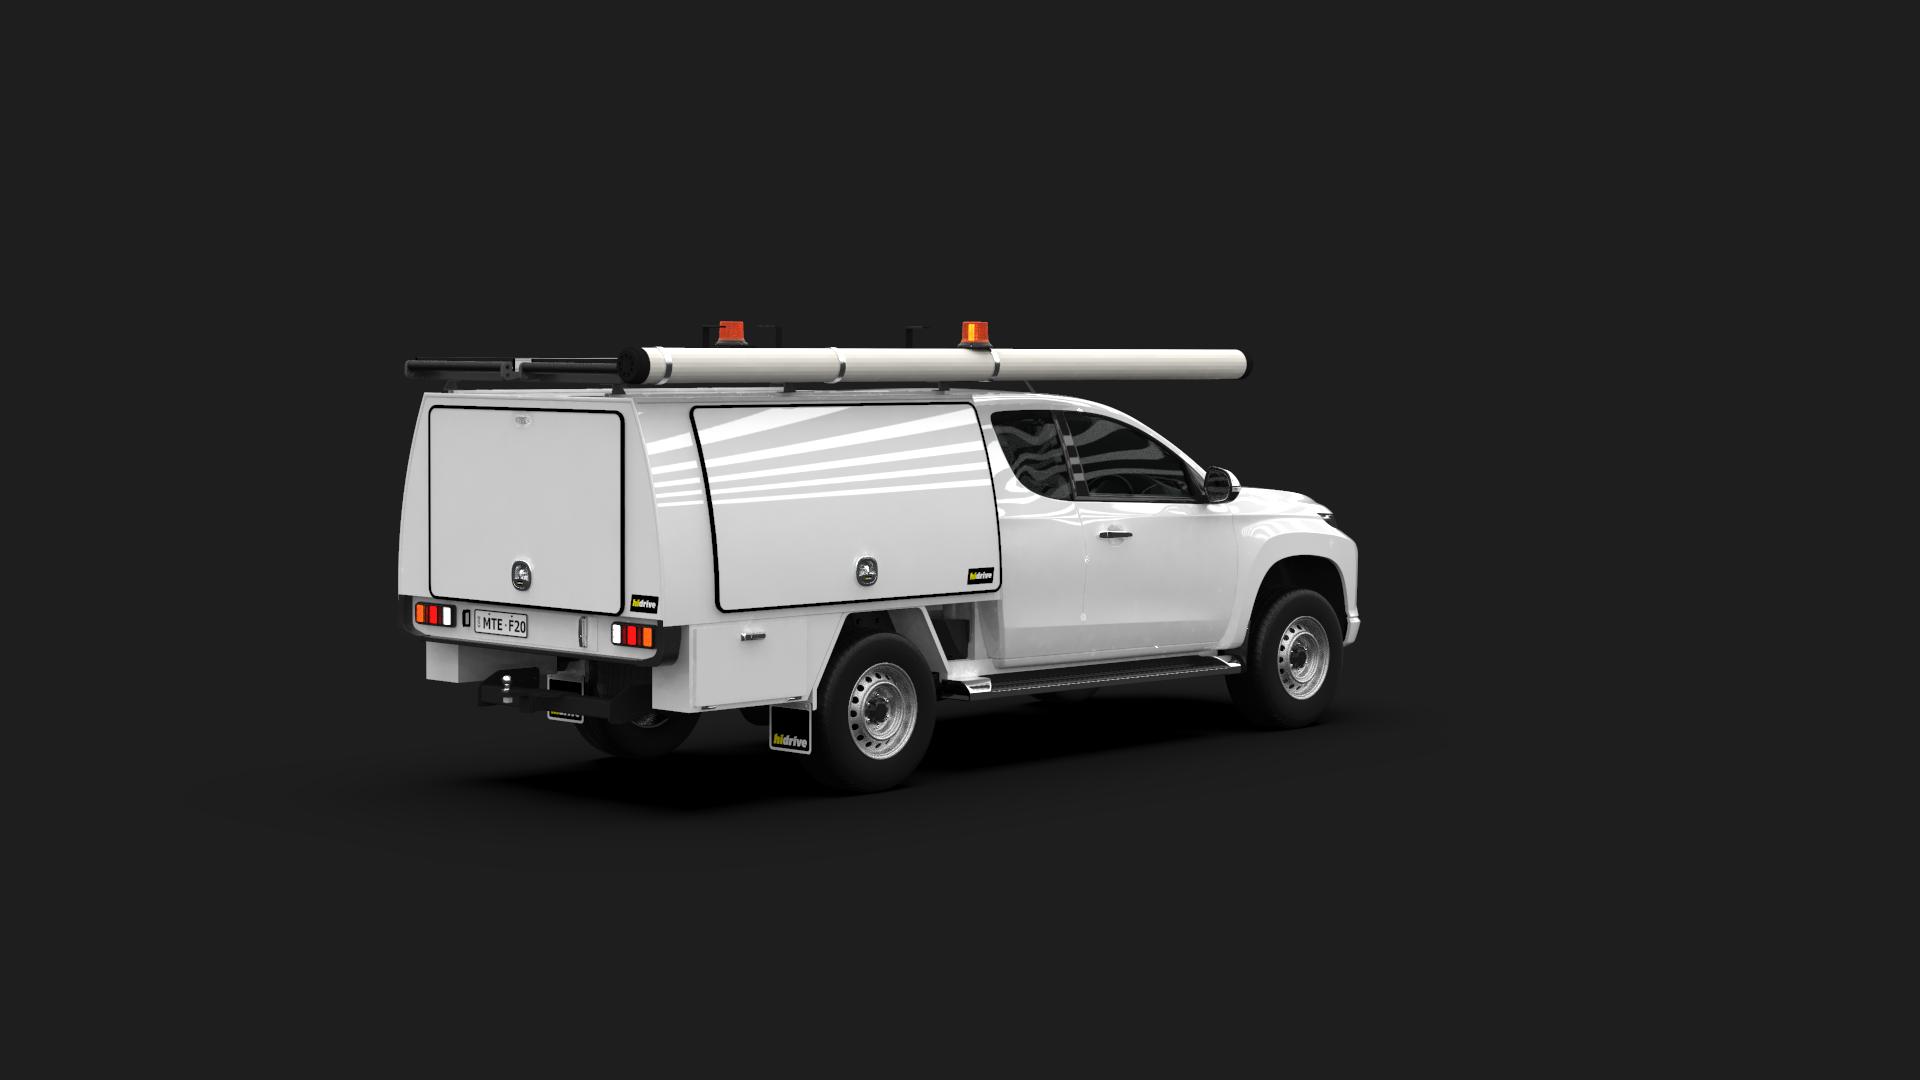 Mitsubishi Triton Club Cab Full Canopy